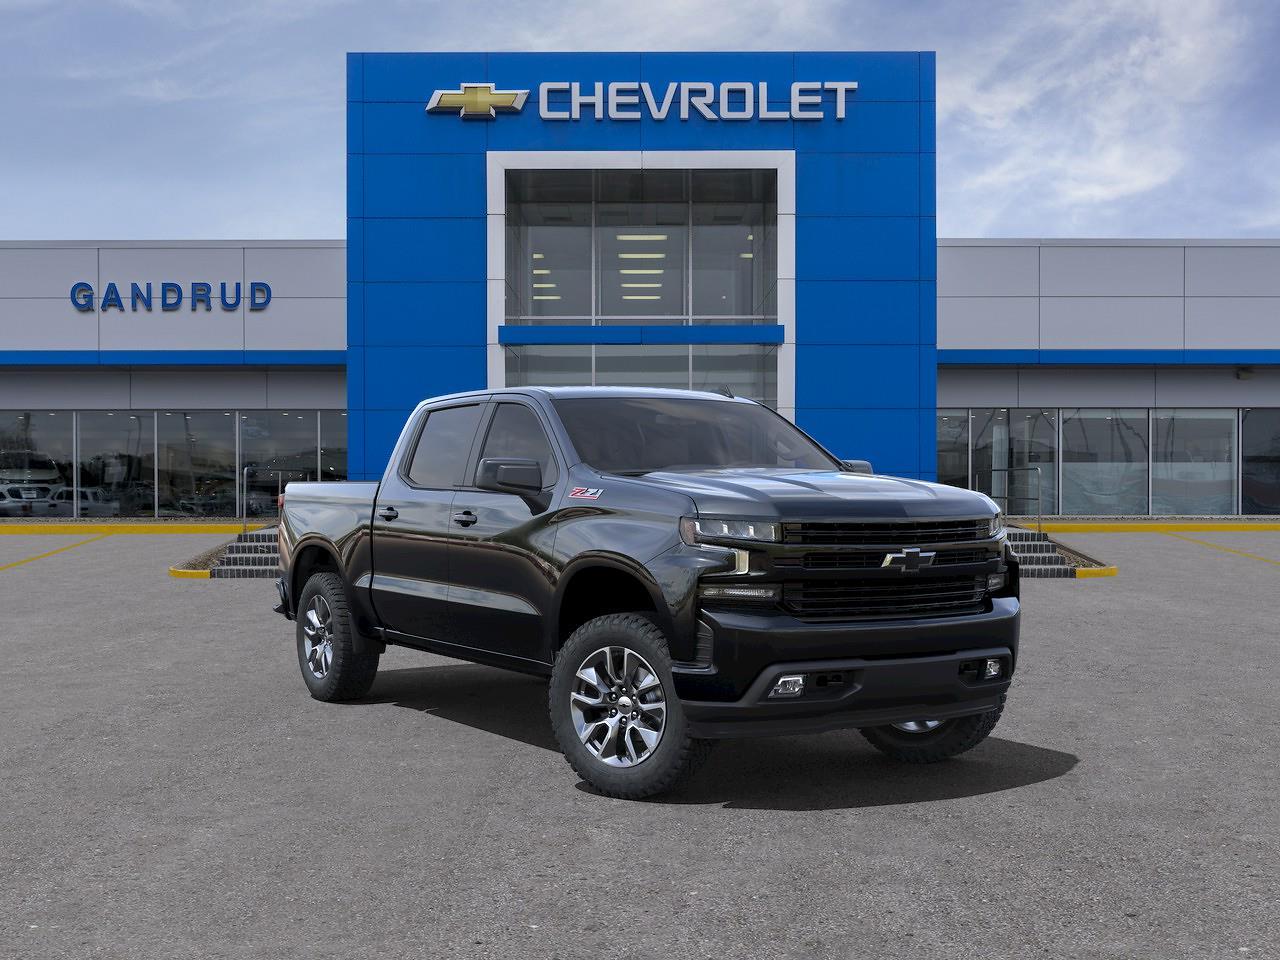 2021 Chevrolet Silverado 1500 Crew Cab 4x4, Pickup #M1340 - photo 1